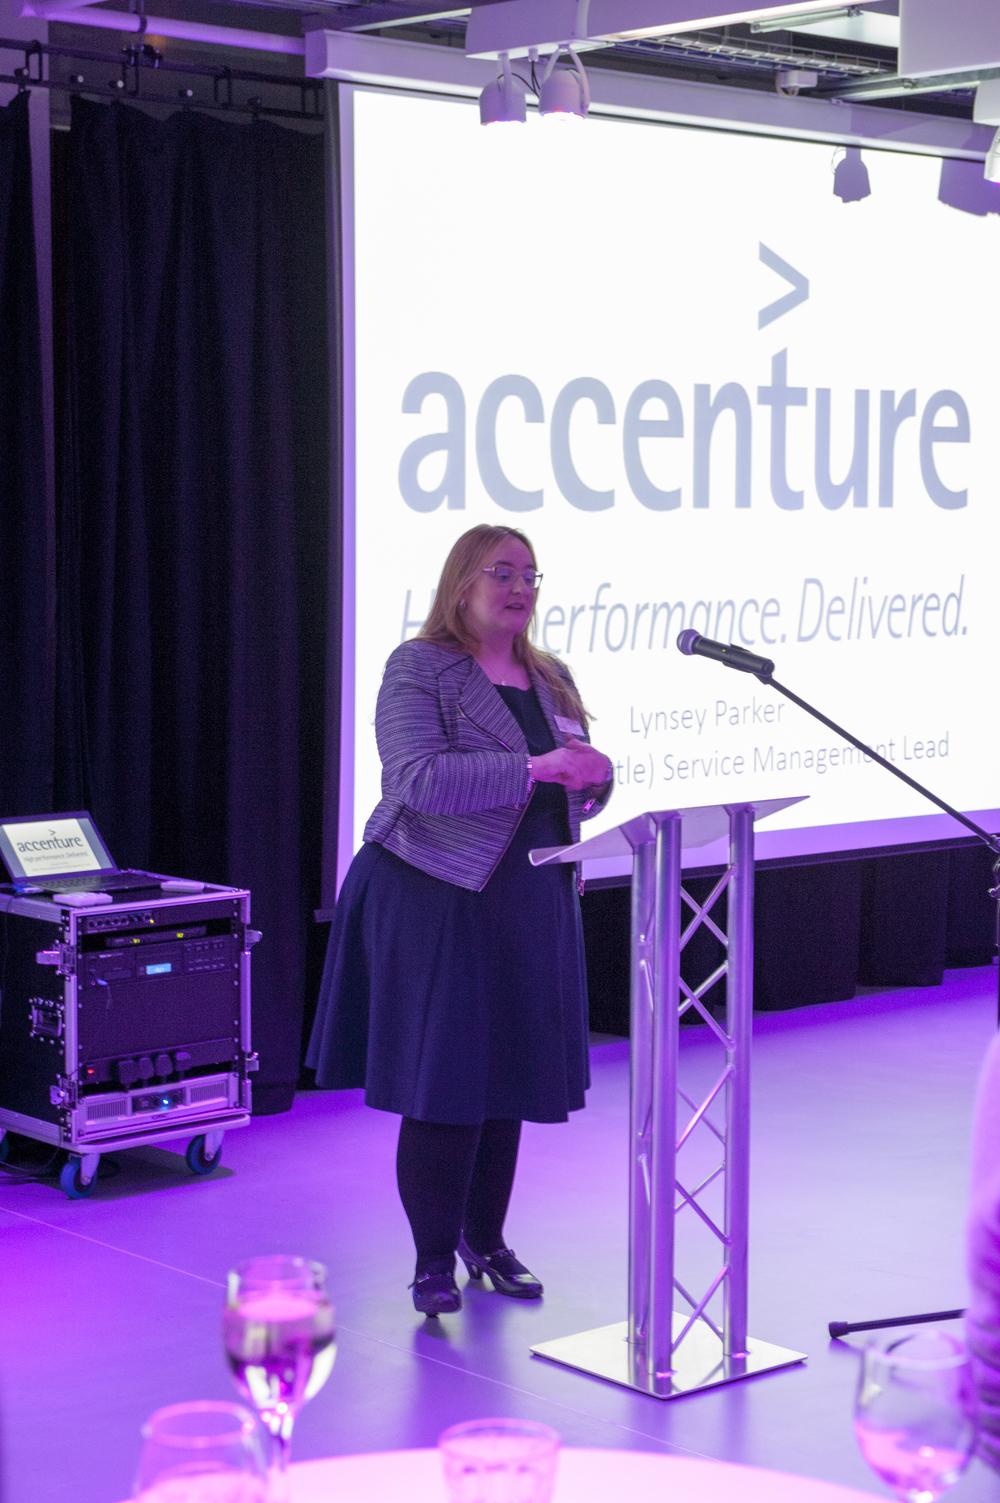 Accenture Girl Geeks Campus Lynsey Parker Event.jpg